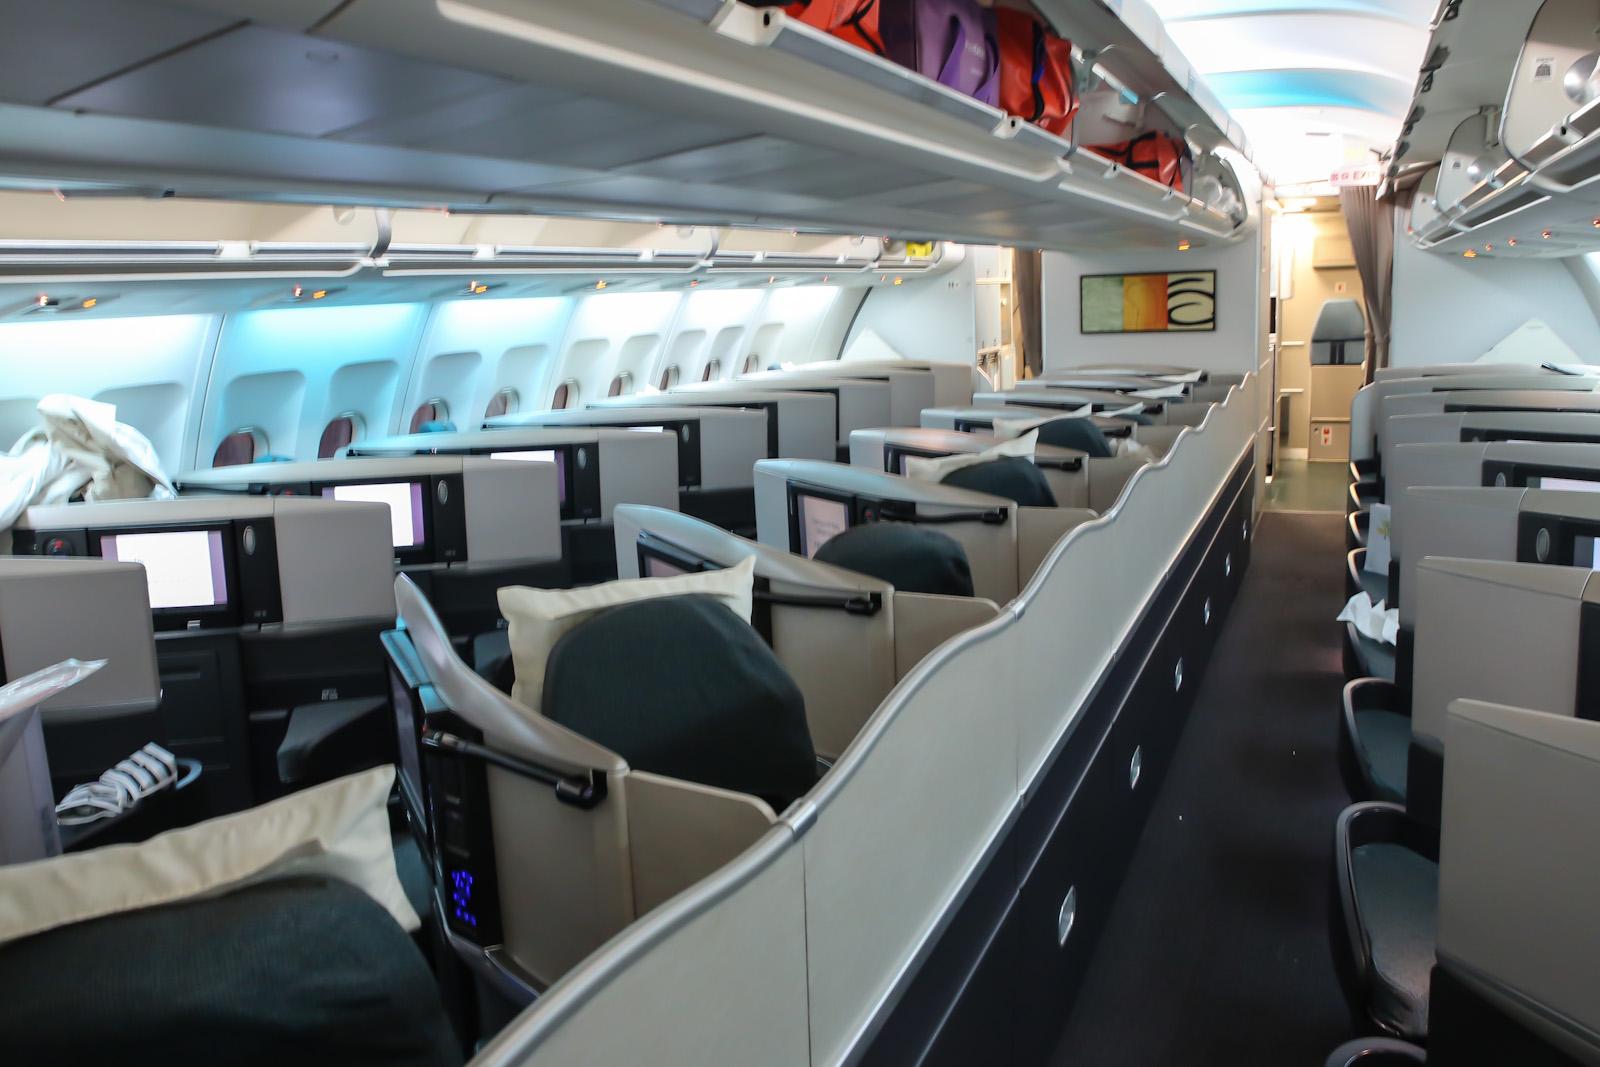 Салон бизнес-класса самолета Airbus A340-300 авиакомпании Cathay Pacific